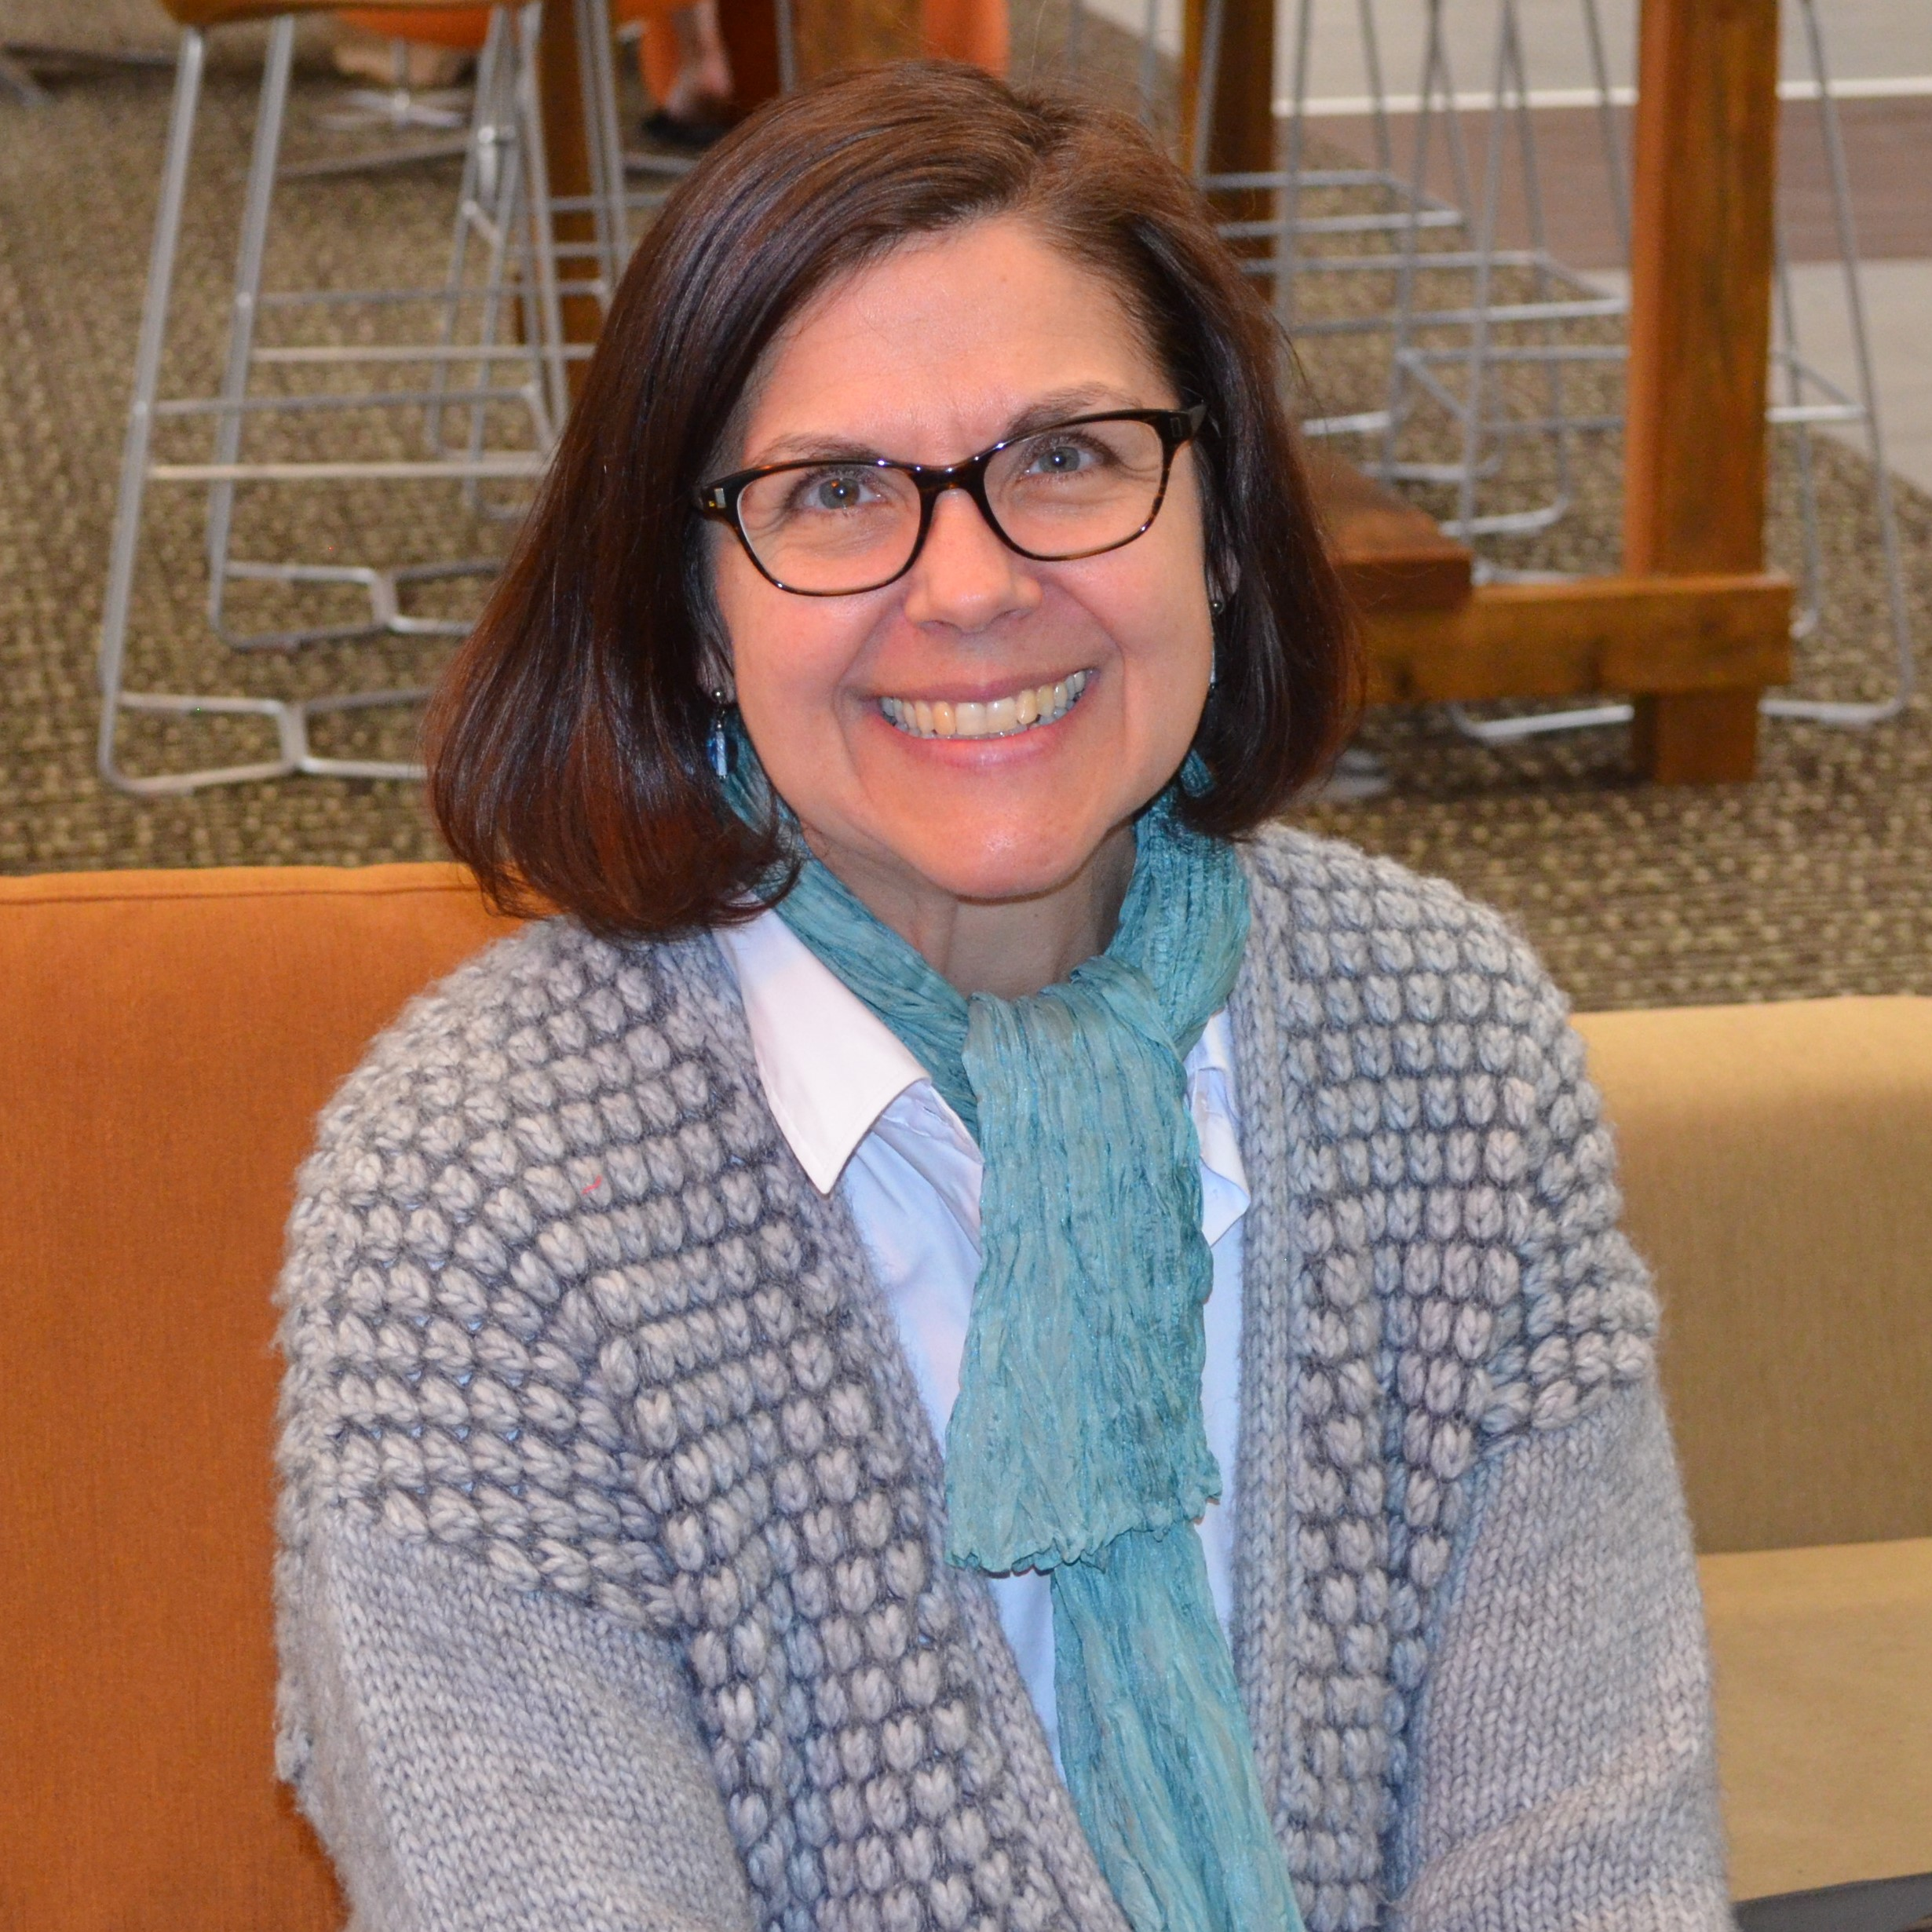 Beth Shiffman